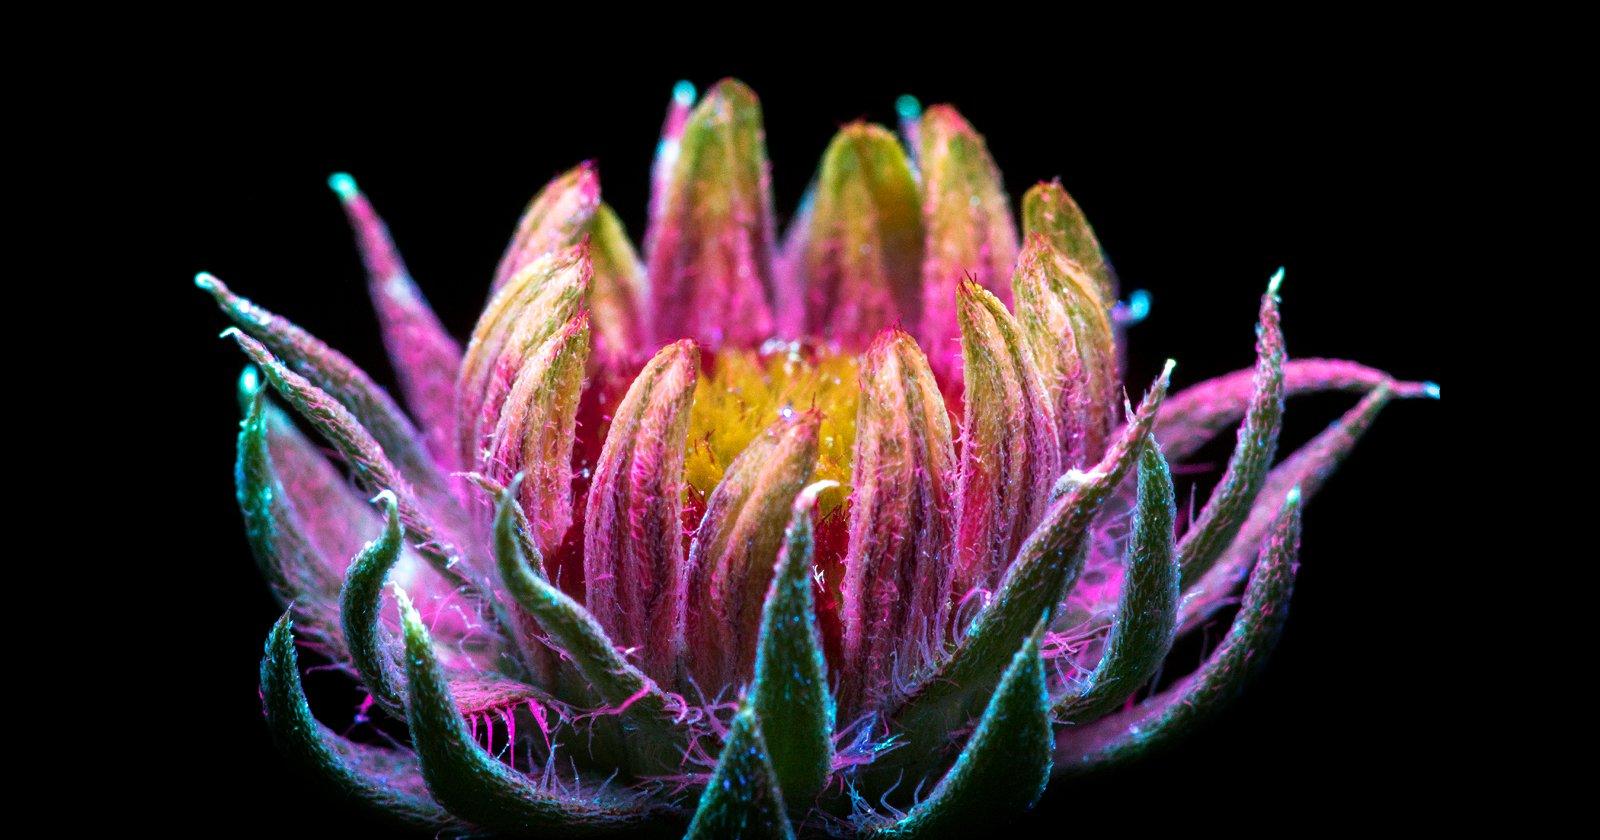 Sparkling Photos of Flowers Glowing Under Intense UV Light